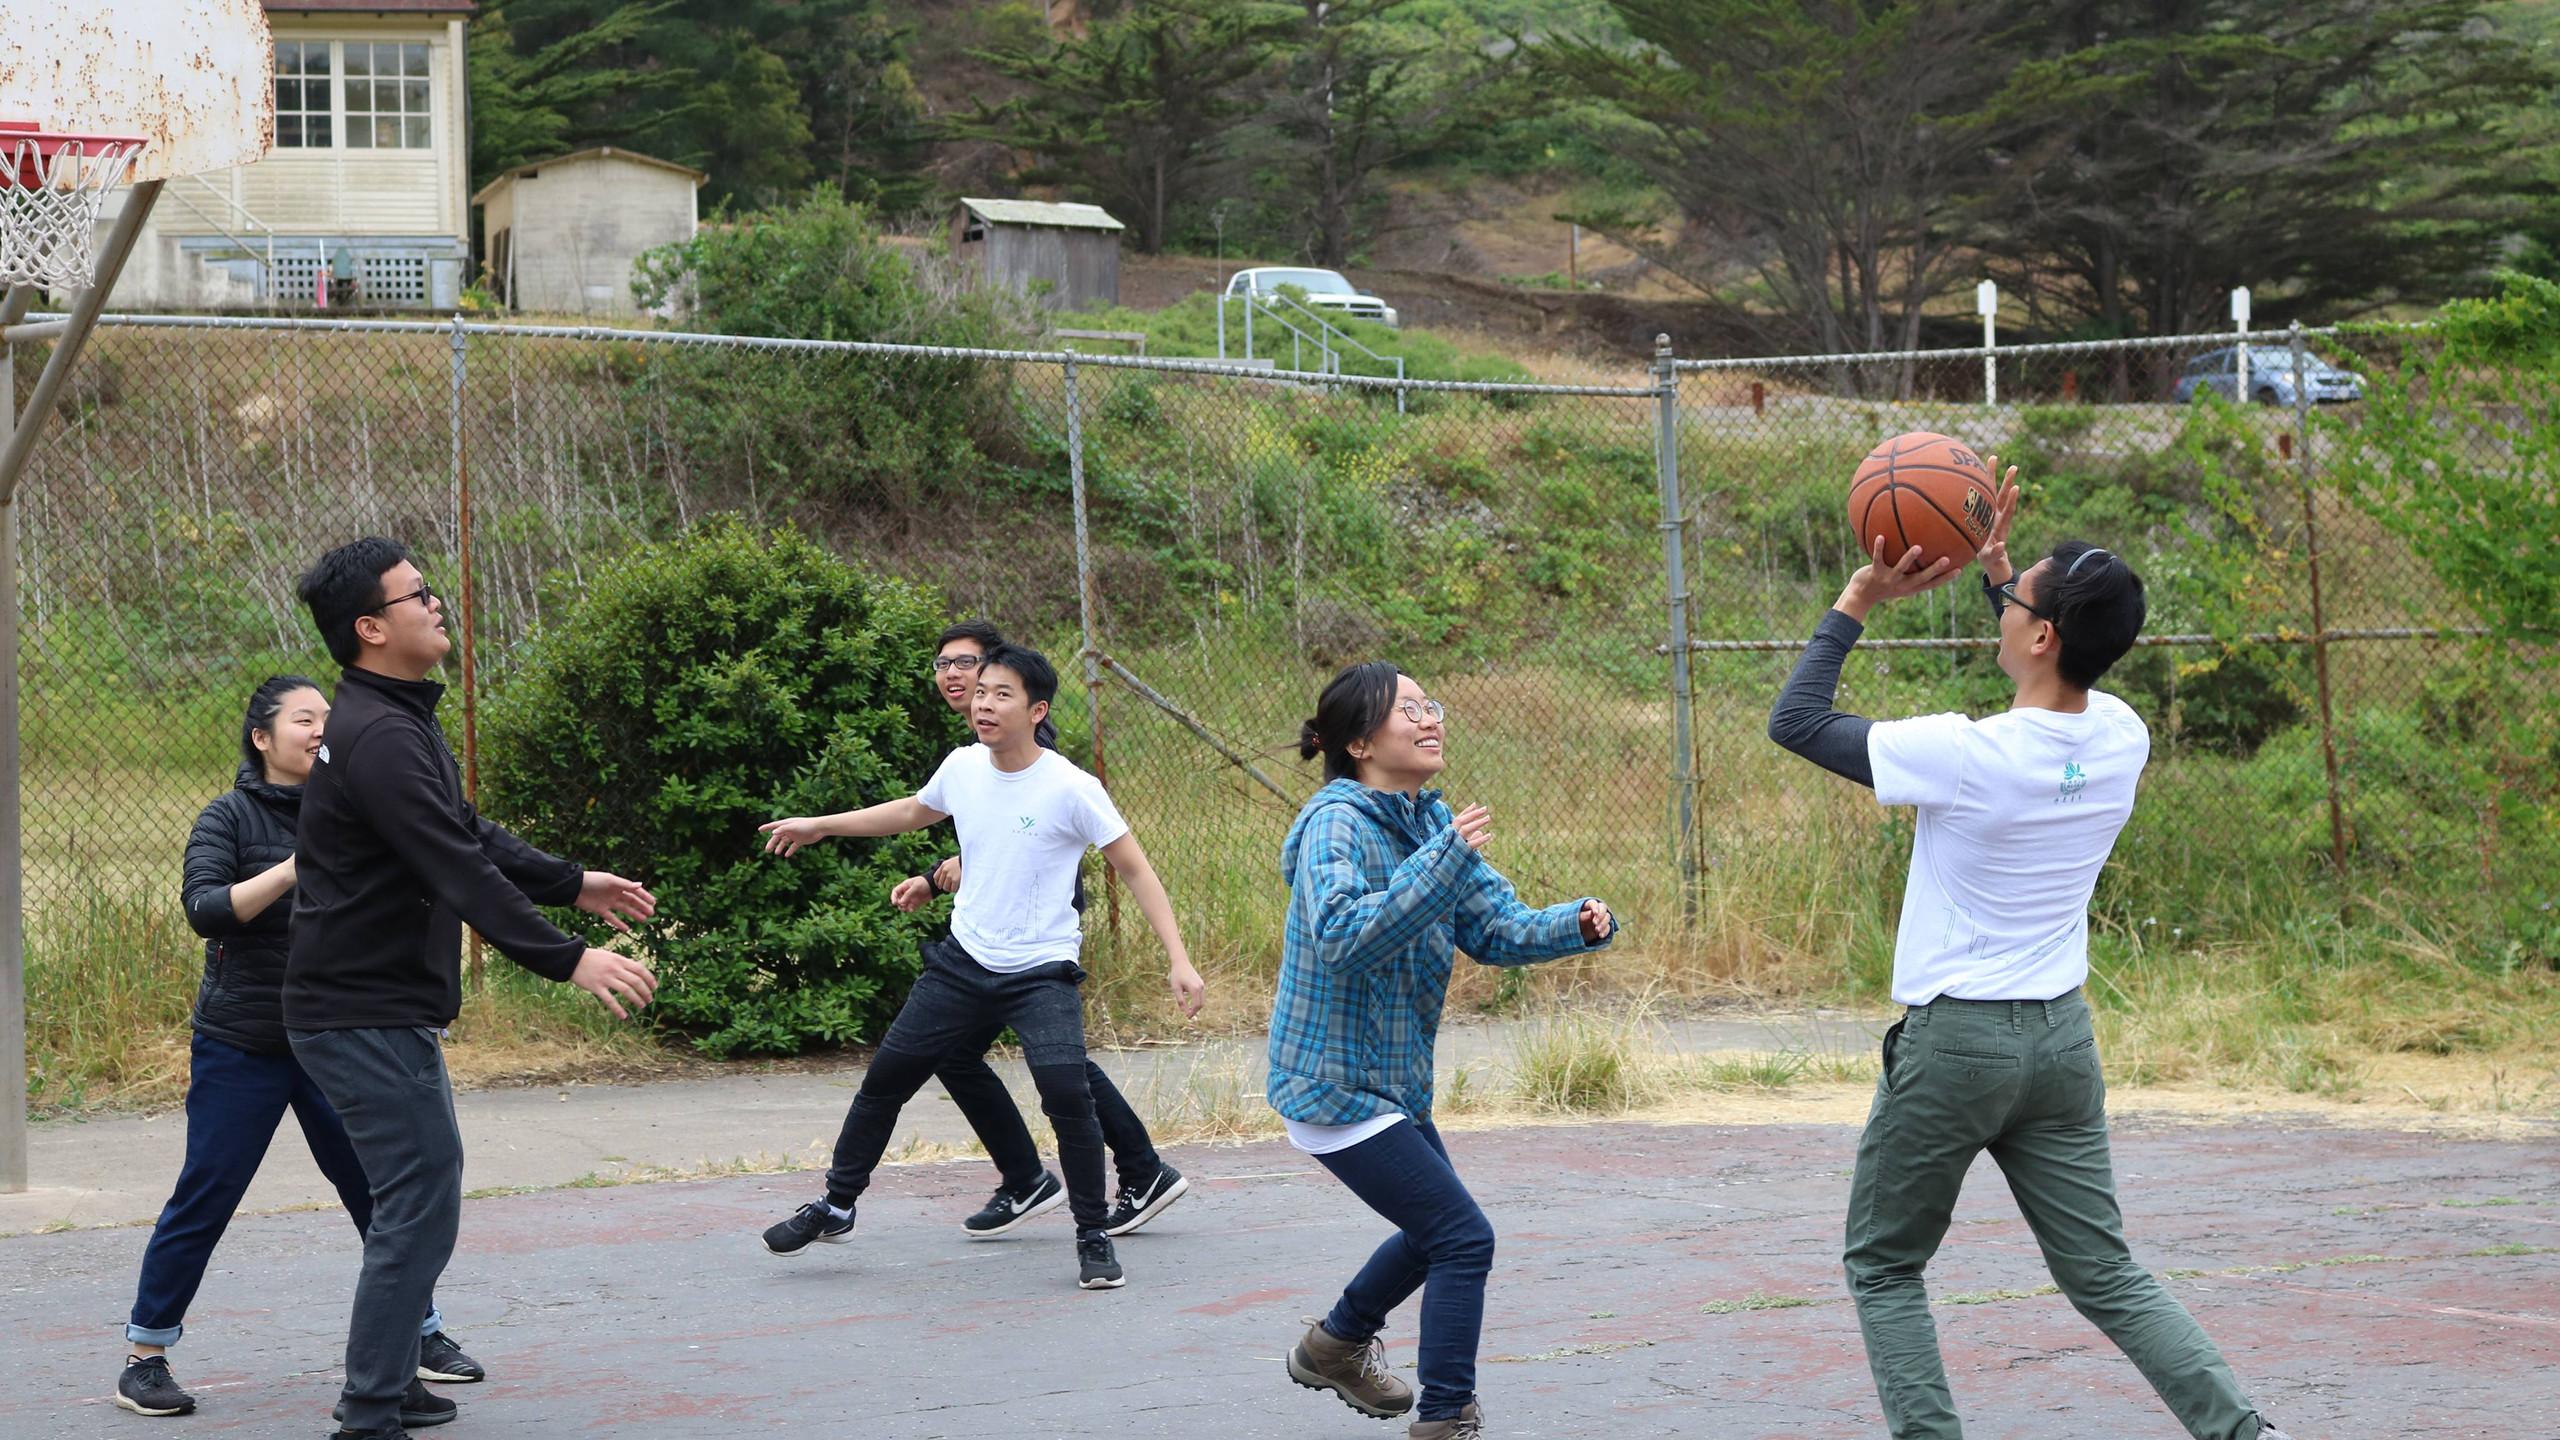 Mindful Basketball